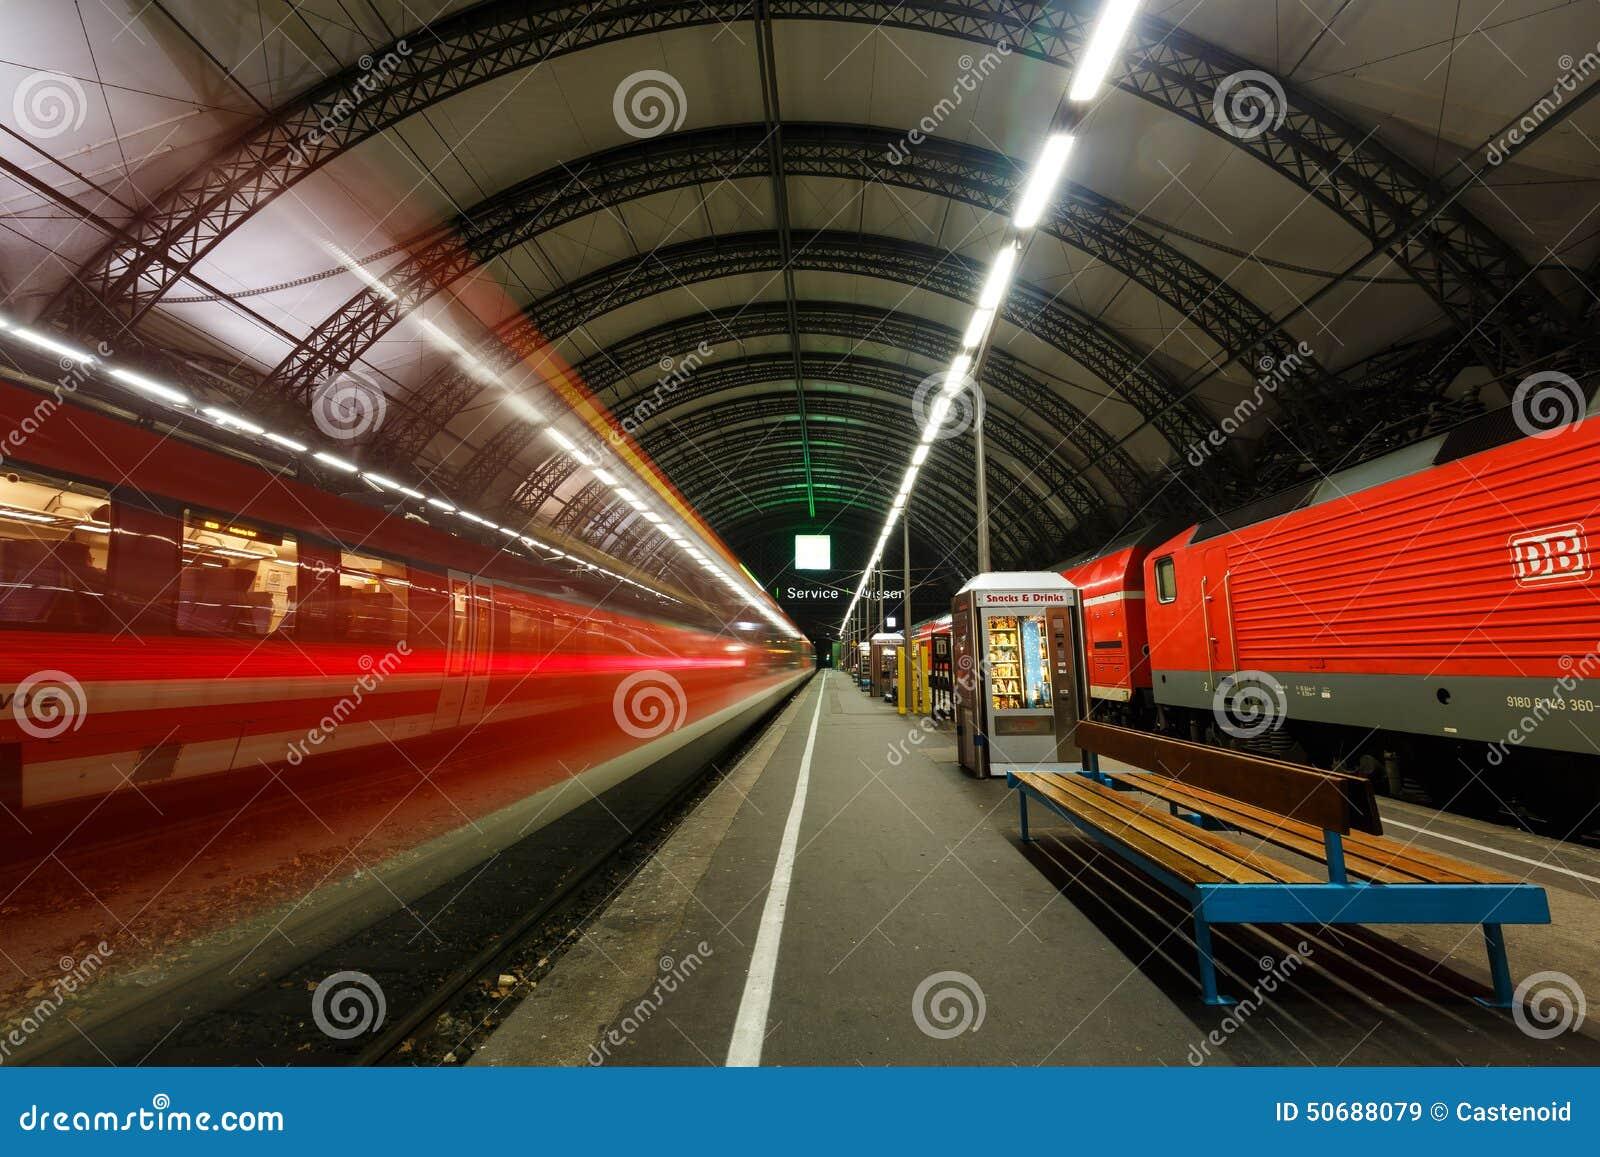 Download 在德累斯顿中央驻地的火车 编辑类库存图片. 图片 包括有 拱道, 铁路, 灯笼, 德国, 行业, 业务量 - 50688079